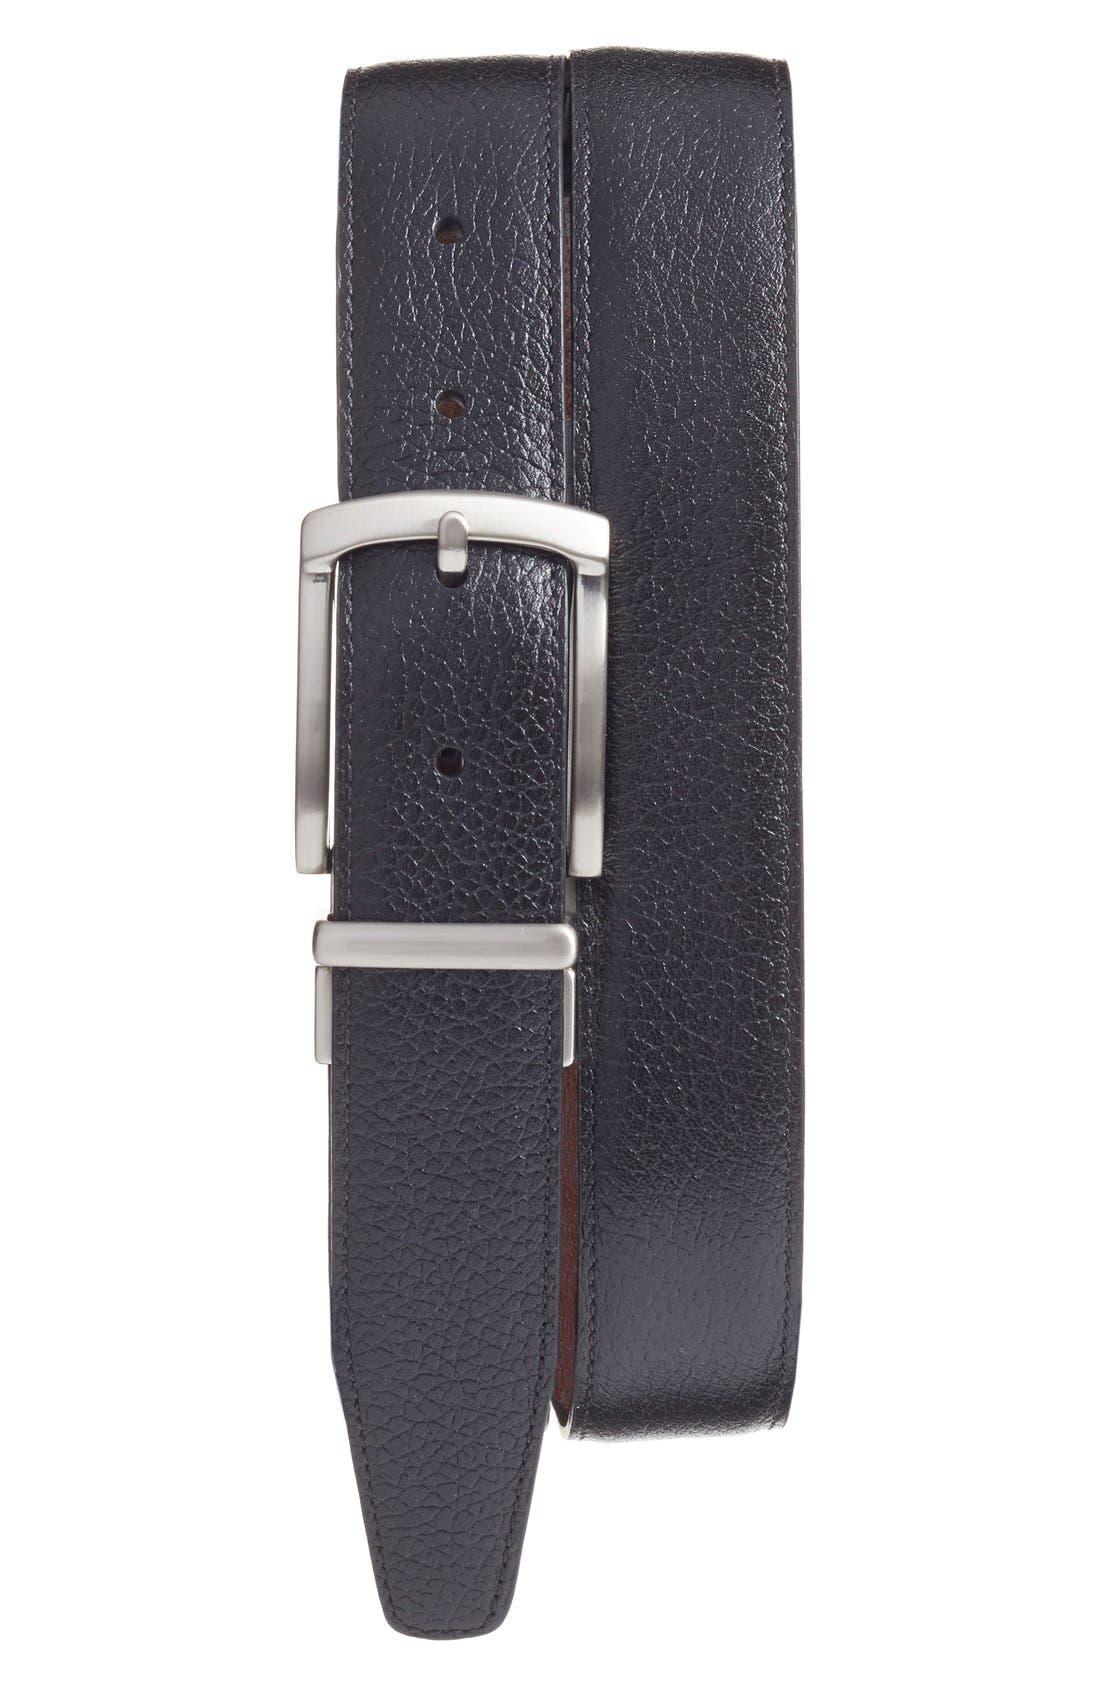 Reversible Leather Belt,                         Main,                         color, Black/ Brown